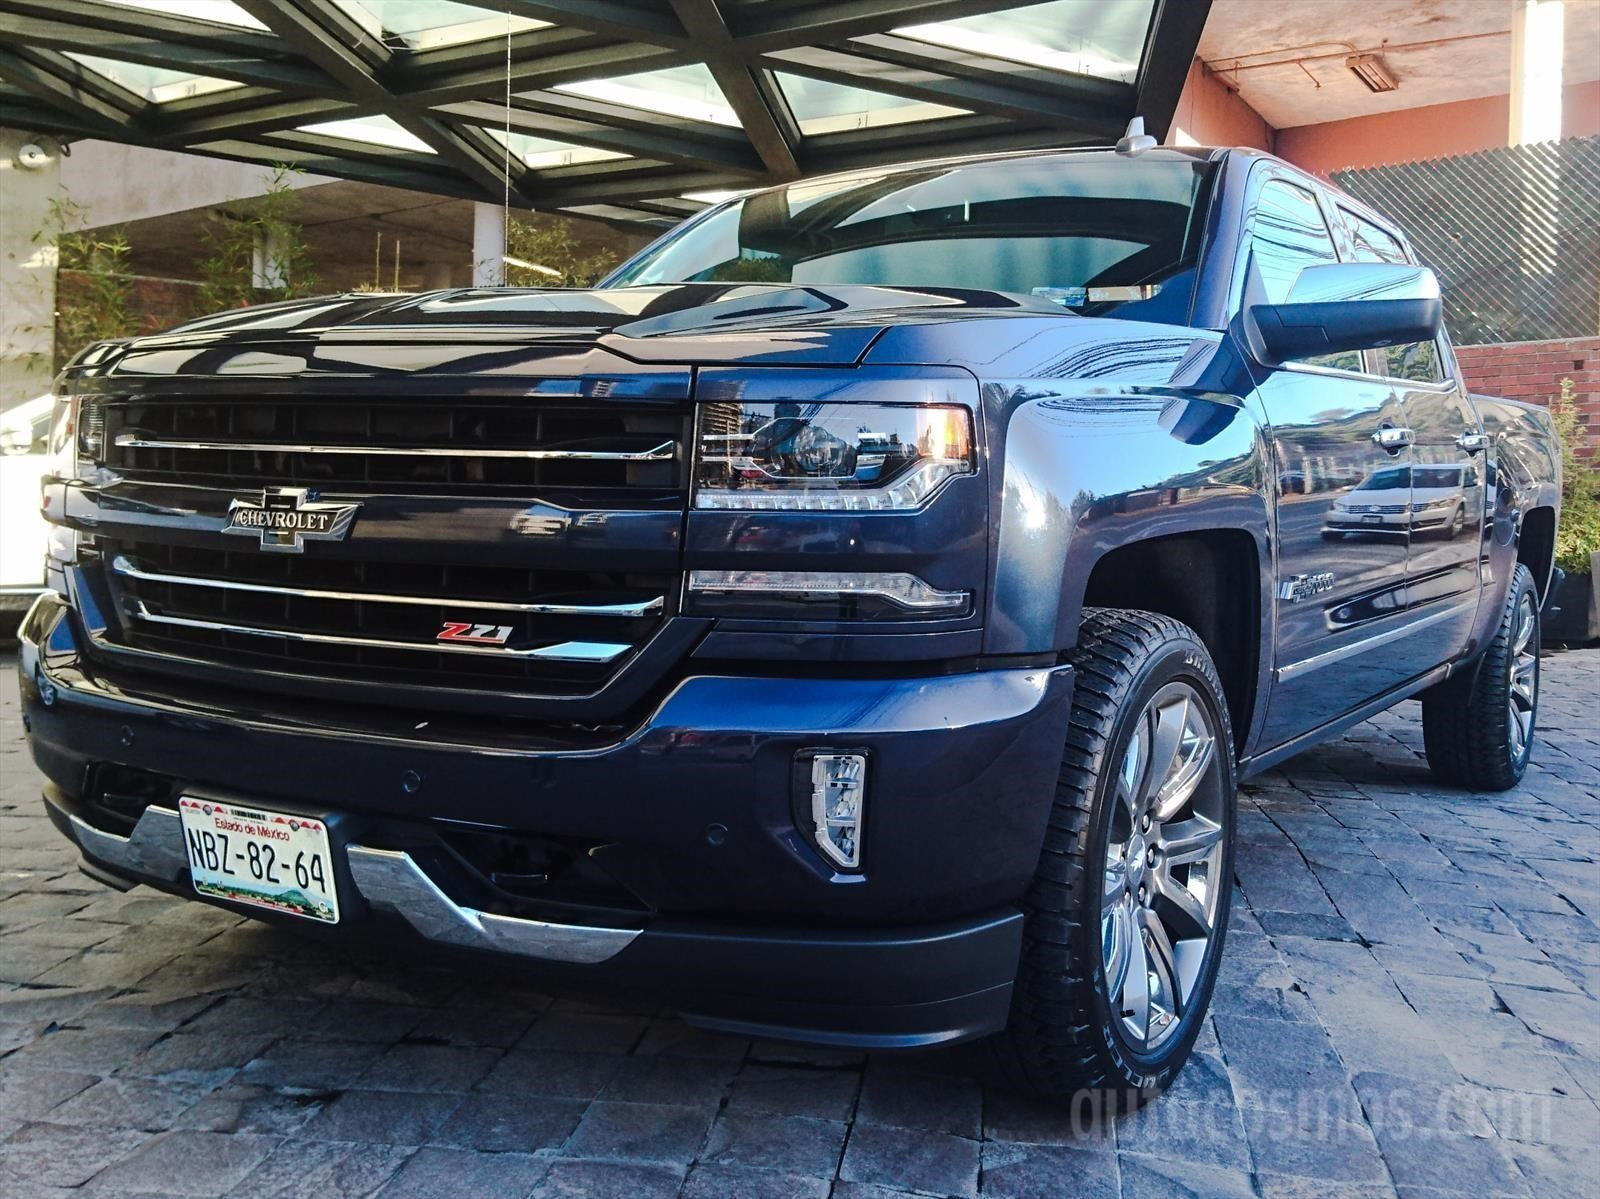 Chevy Cheyenne Concept >> Chevrolet Cheyenne 2018   Best new cars for 2018